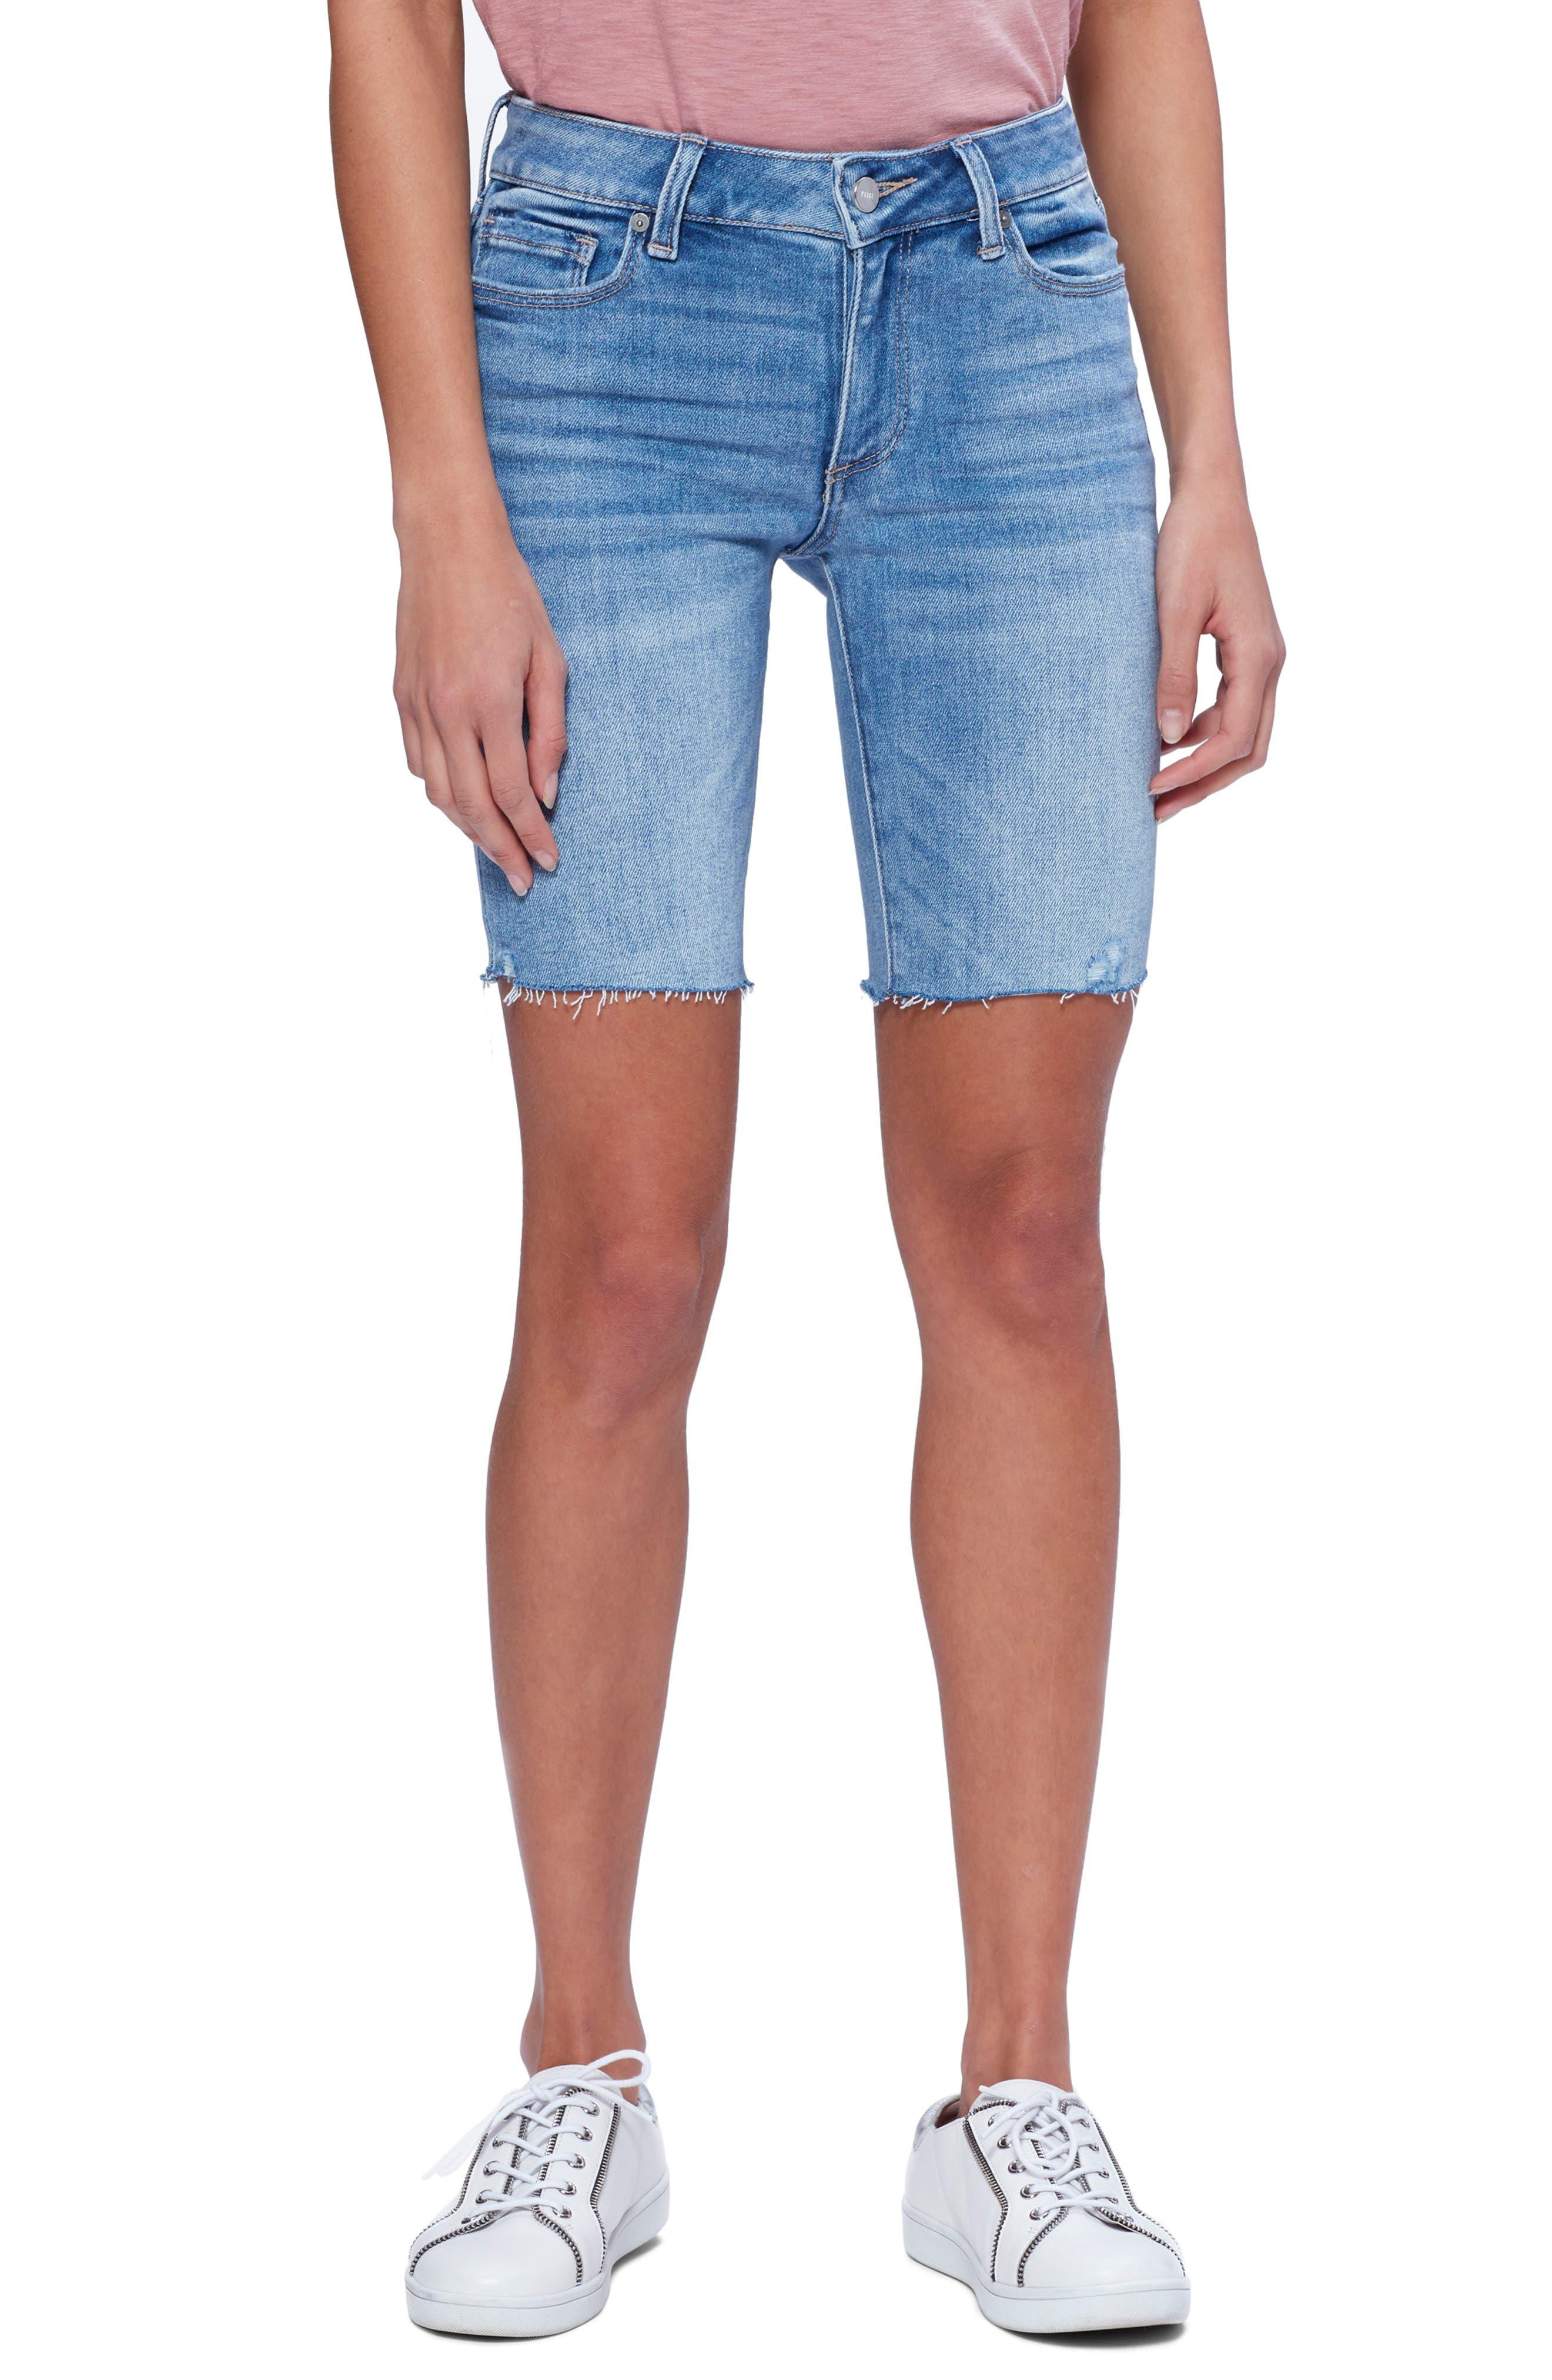 Paige Pants Vintage - Jax Cutoff Bermuda Shorts